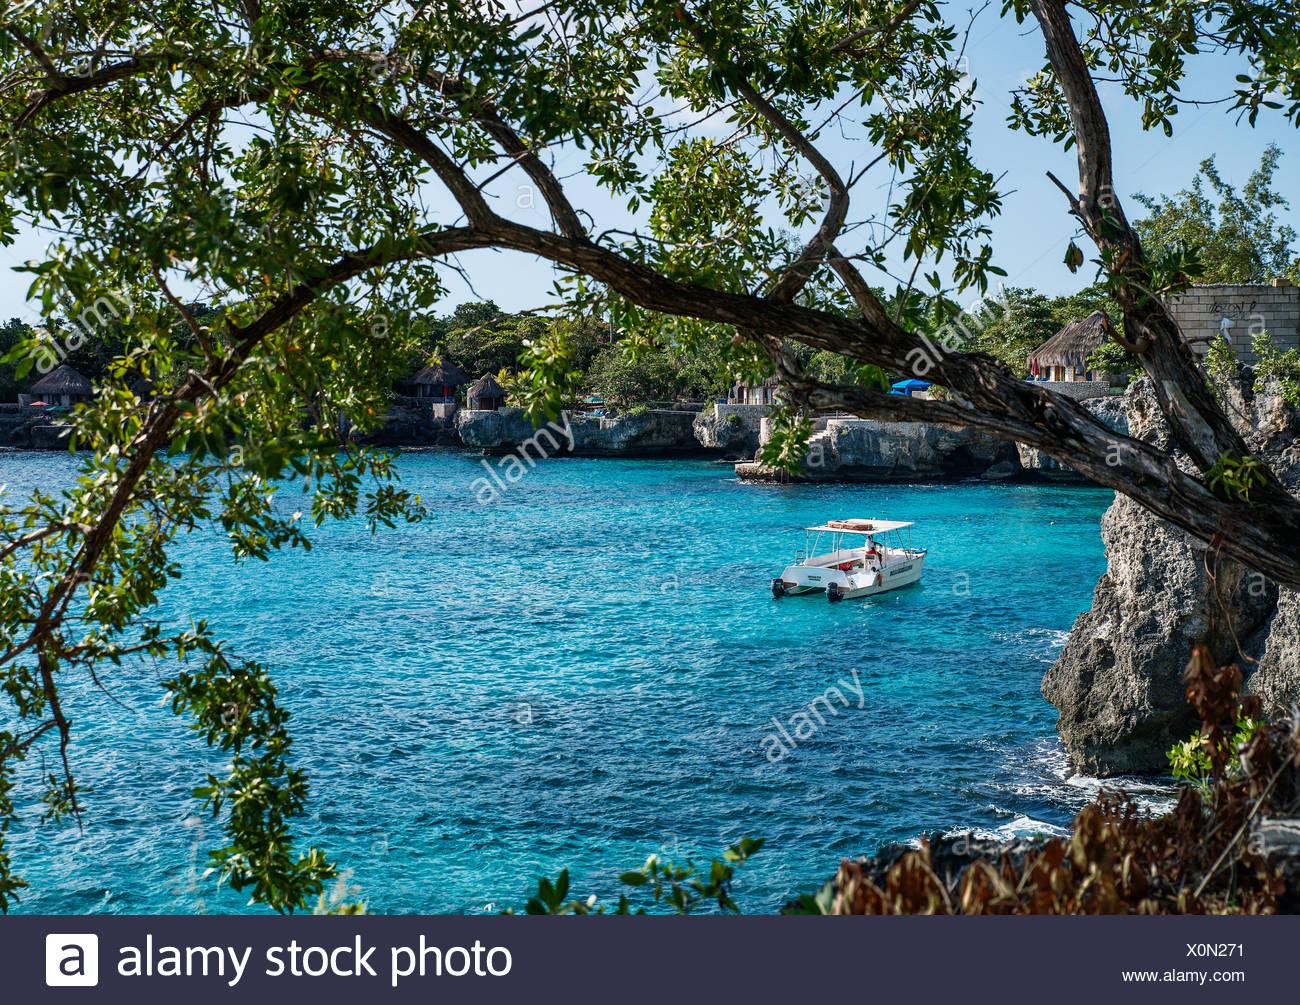 West end coastsline, Negril, Jamaica - Stock Image